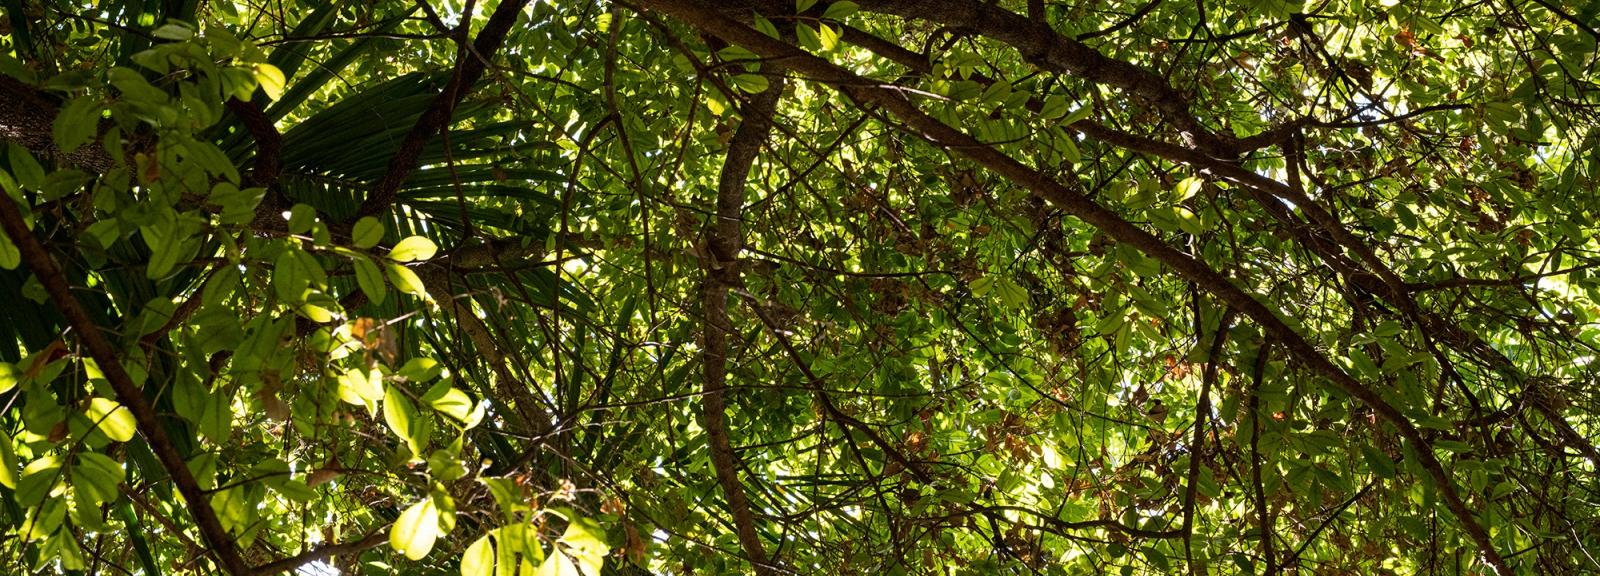 Brush cherry (Eugenia myrtifolia) - Jardin botanique Val Rahmeh-Menton © MNHN - Agnès Iatzoura